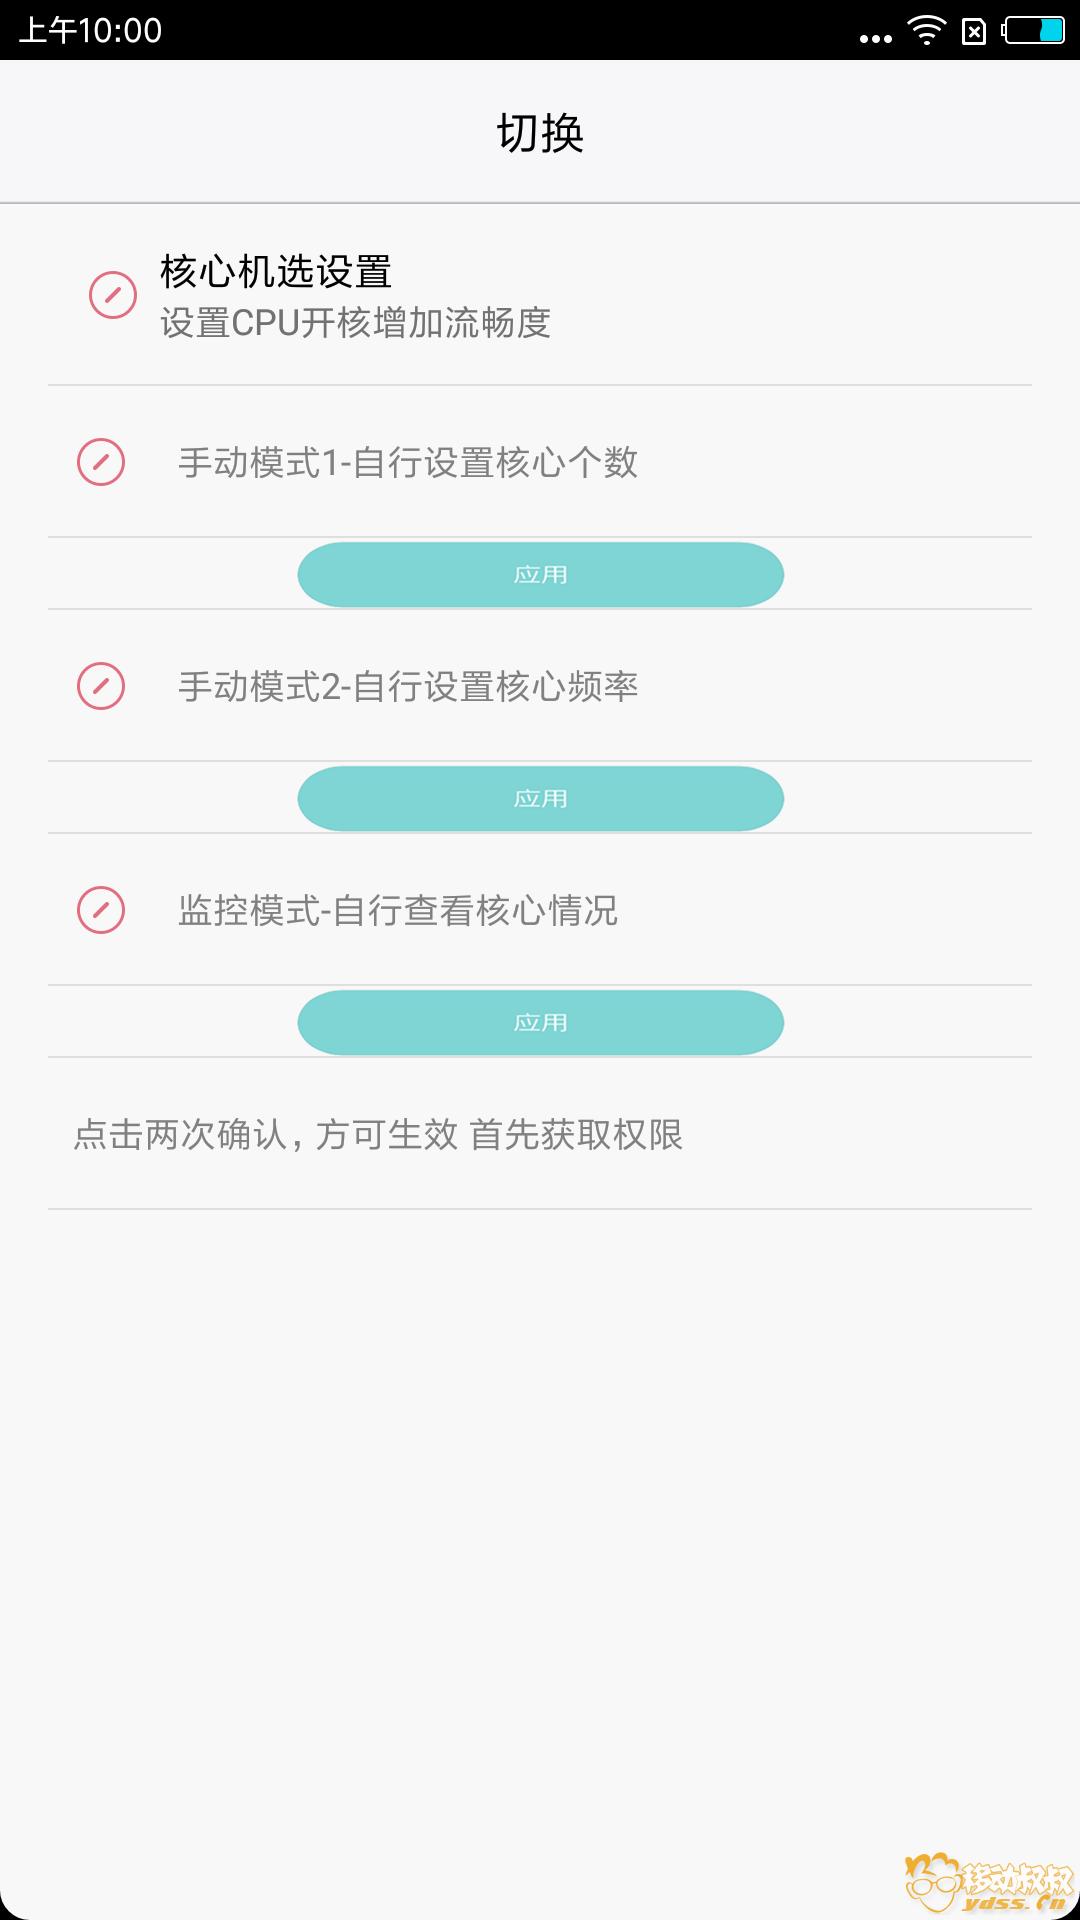 Screenshot_2018-03-28-10-00-32-776_com.nkll.settings.png